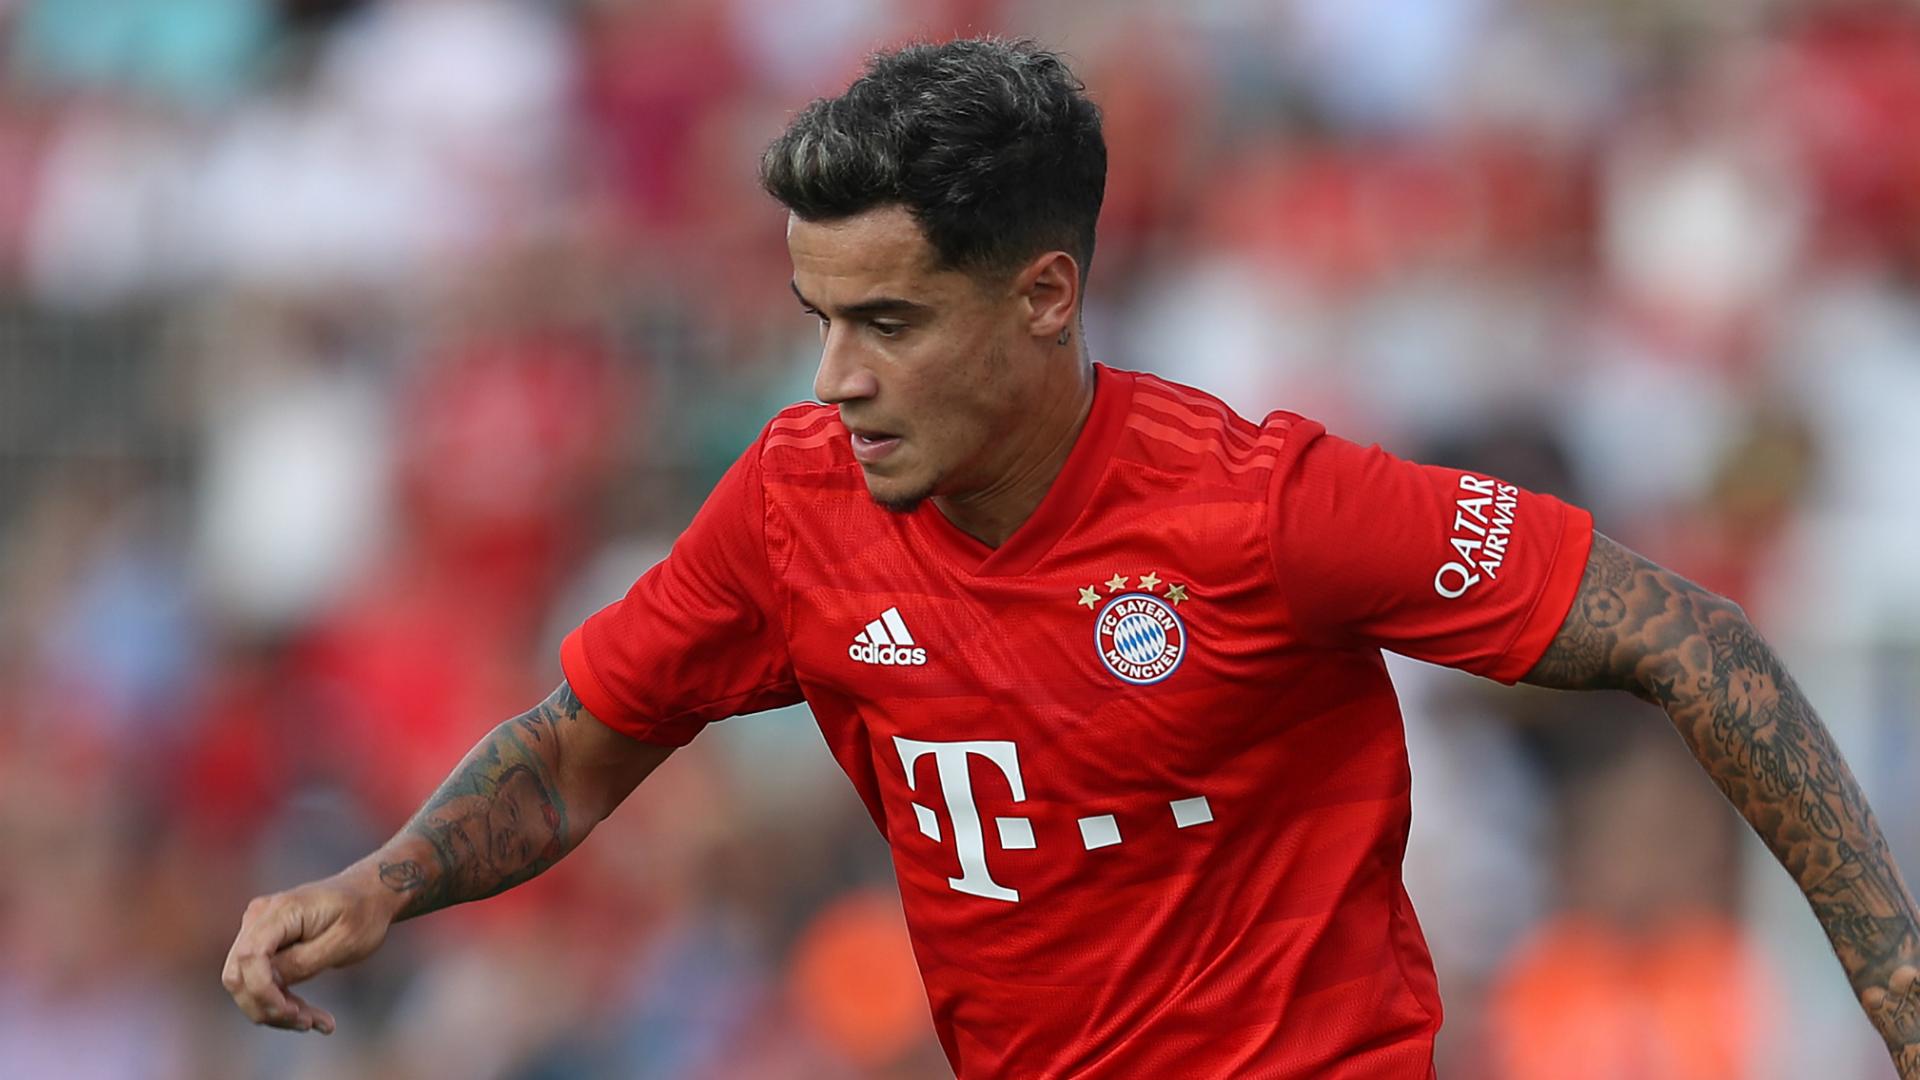 Kovac to assess Coutinho before crunch RB Leipzig clash